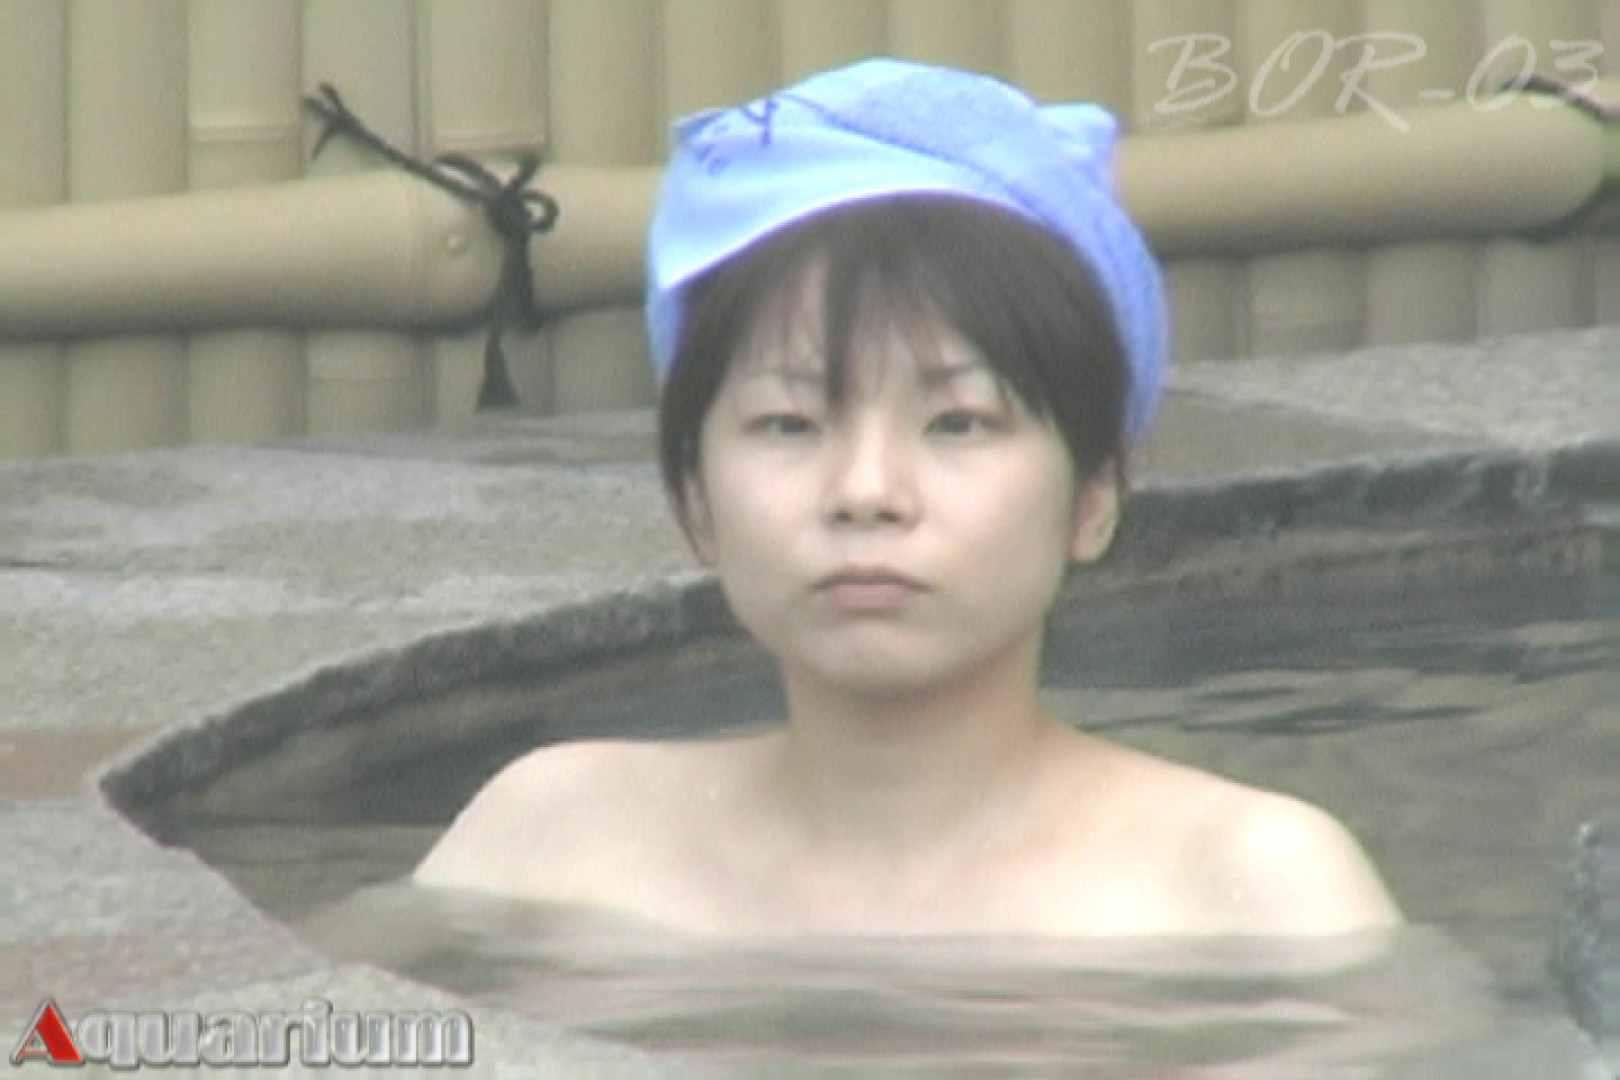 Aquaな露天風呂Vol.489 0 | 0  21連発 11